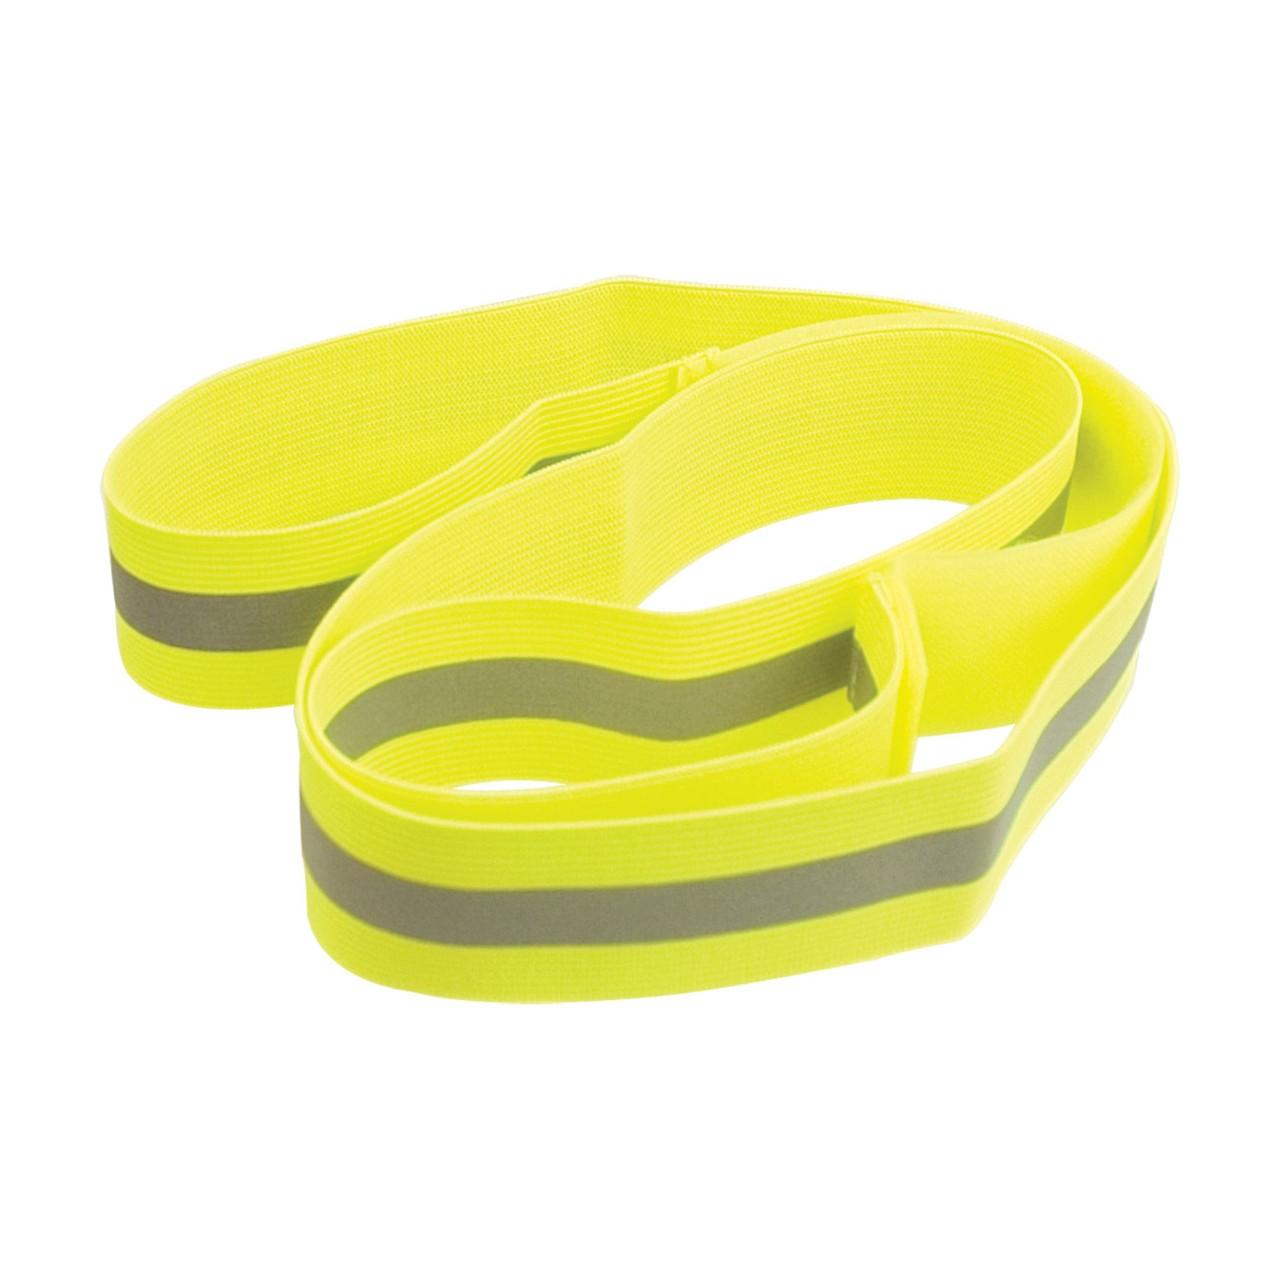 yellow wheelchair papasan chair cushion pier one maxiaids safety wrap fluor silver stripe